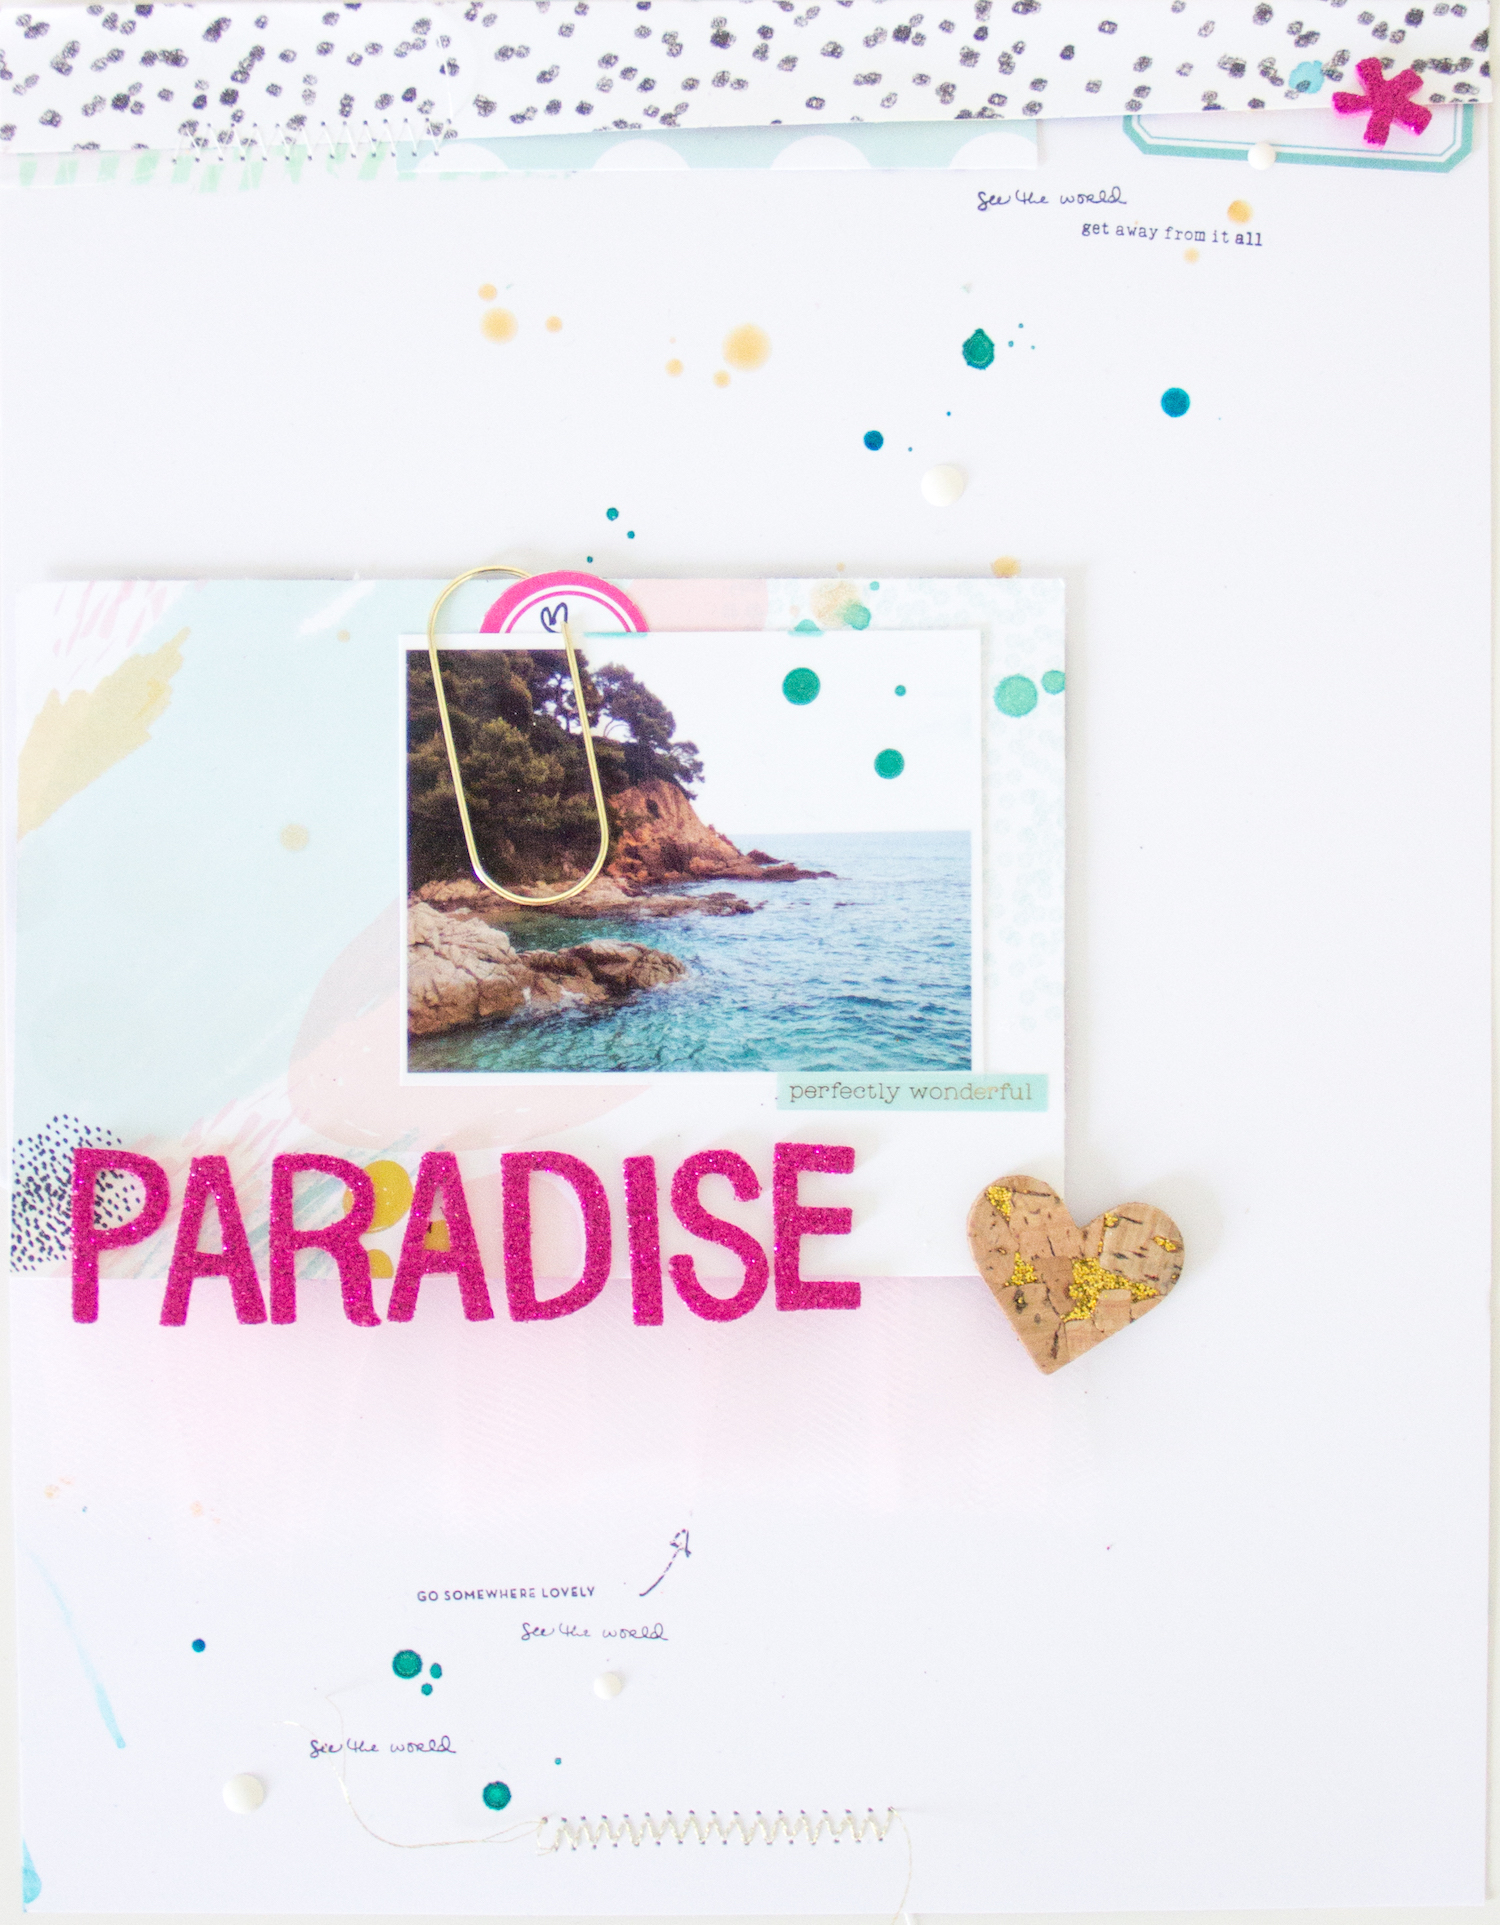 Paradise_Scrapbooking_Layout_ScatteredConfetti_ScrapbookWerkstatt_Bloghop_7Paper_0